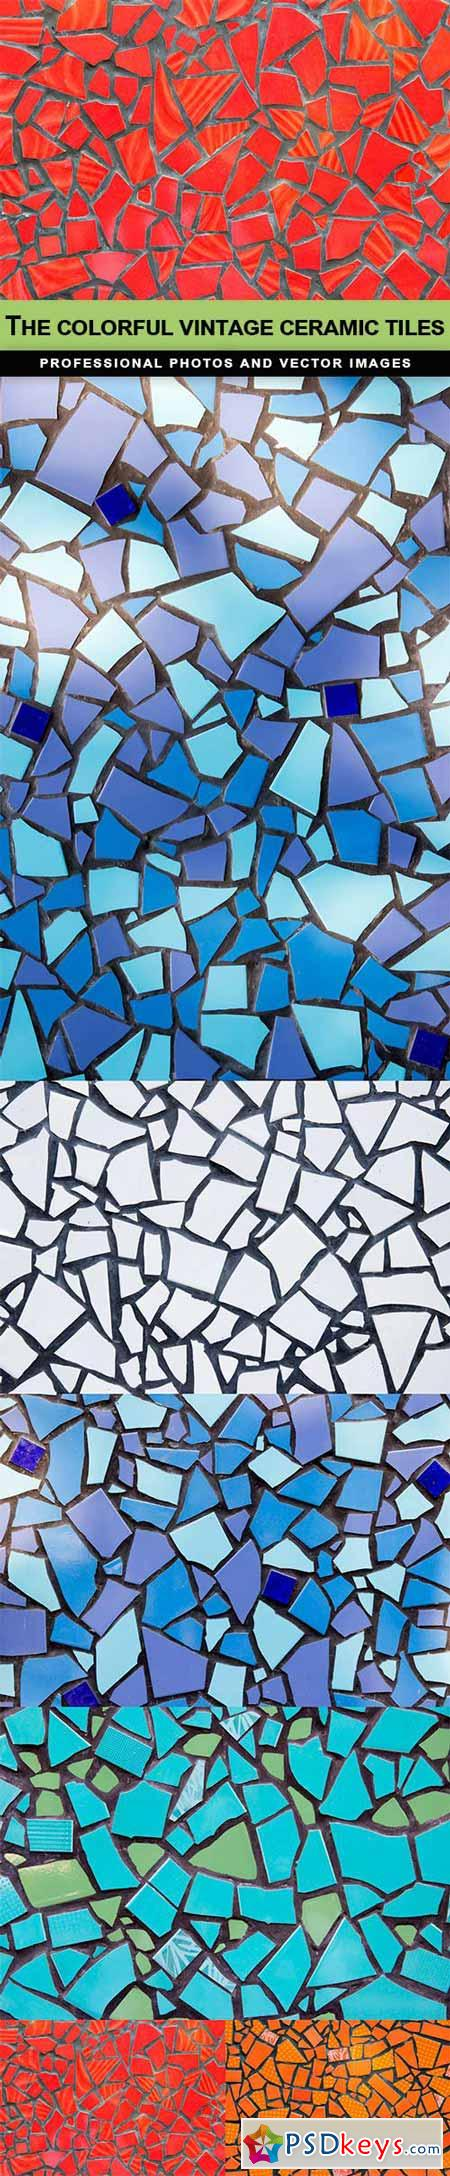 The colorful vintage ceramic tiles - 6 UHQ JPEG